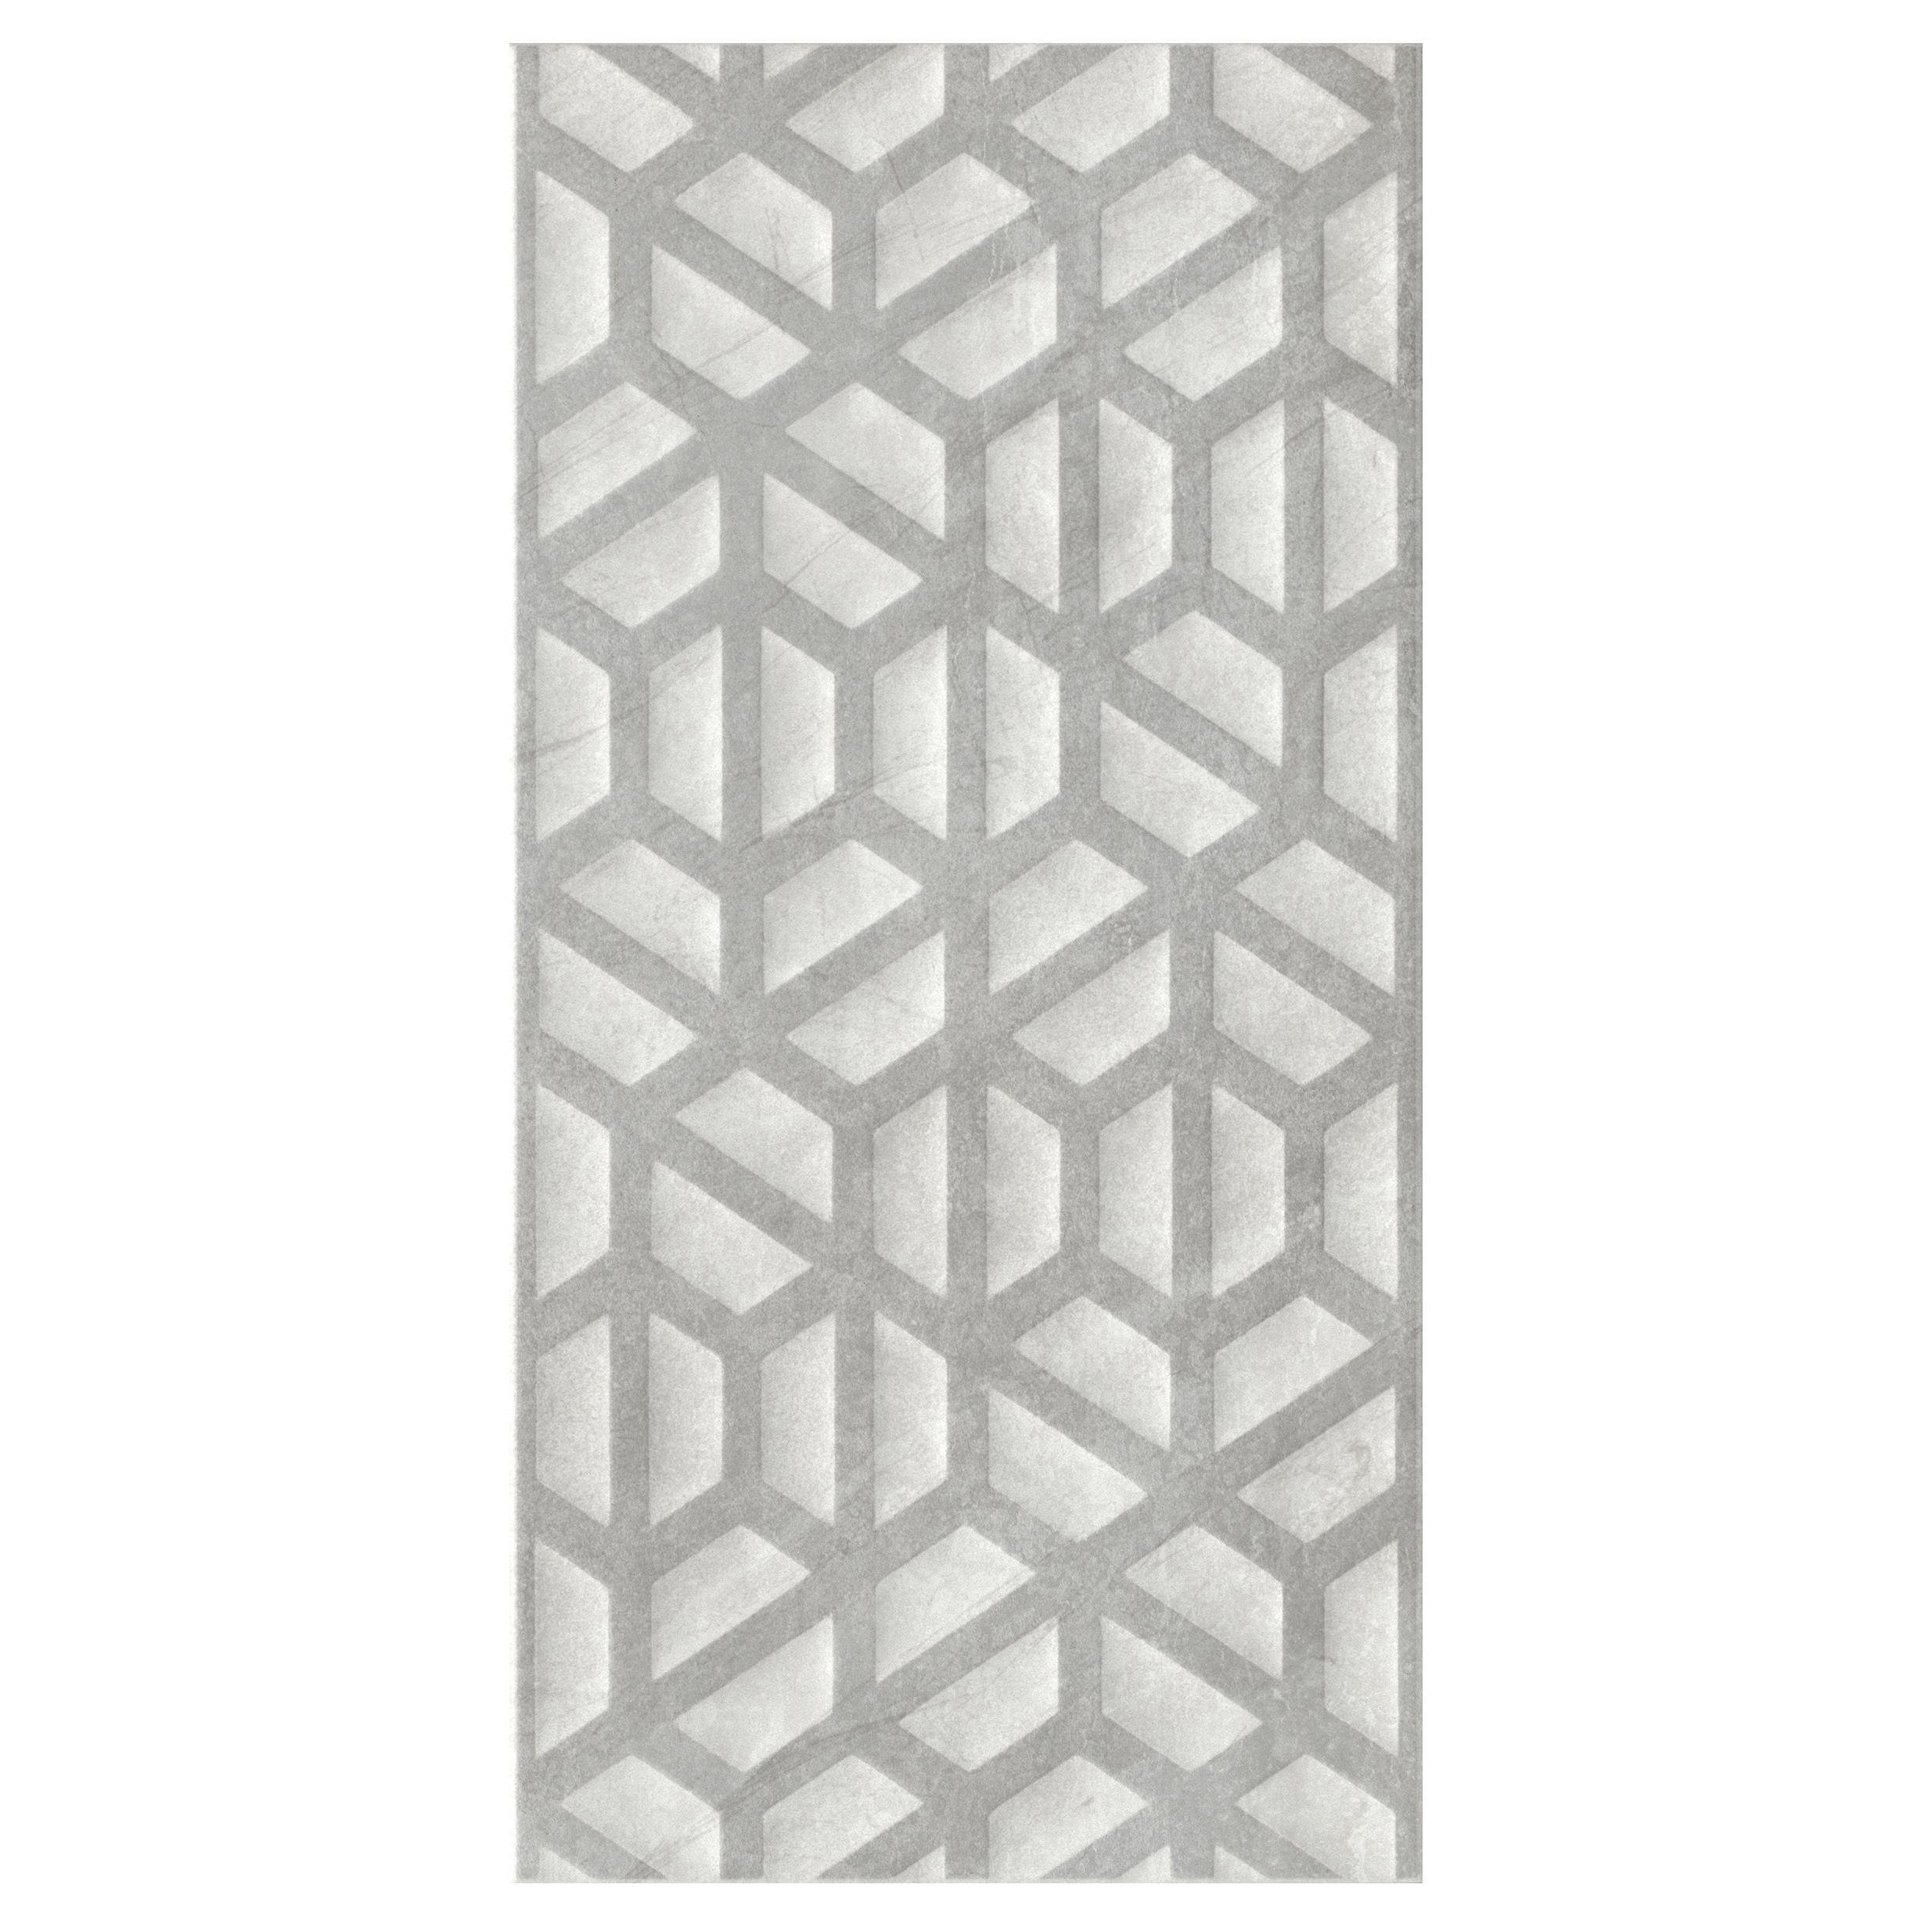 Manhattan Grey Matt Ceramic Wall Tile Pack Of 5 L 600mm W 300mm Departments Diy At B Q